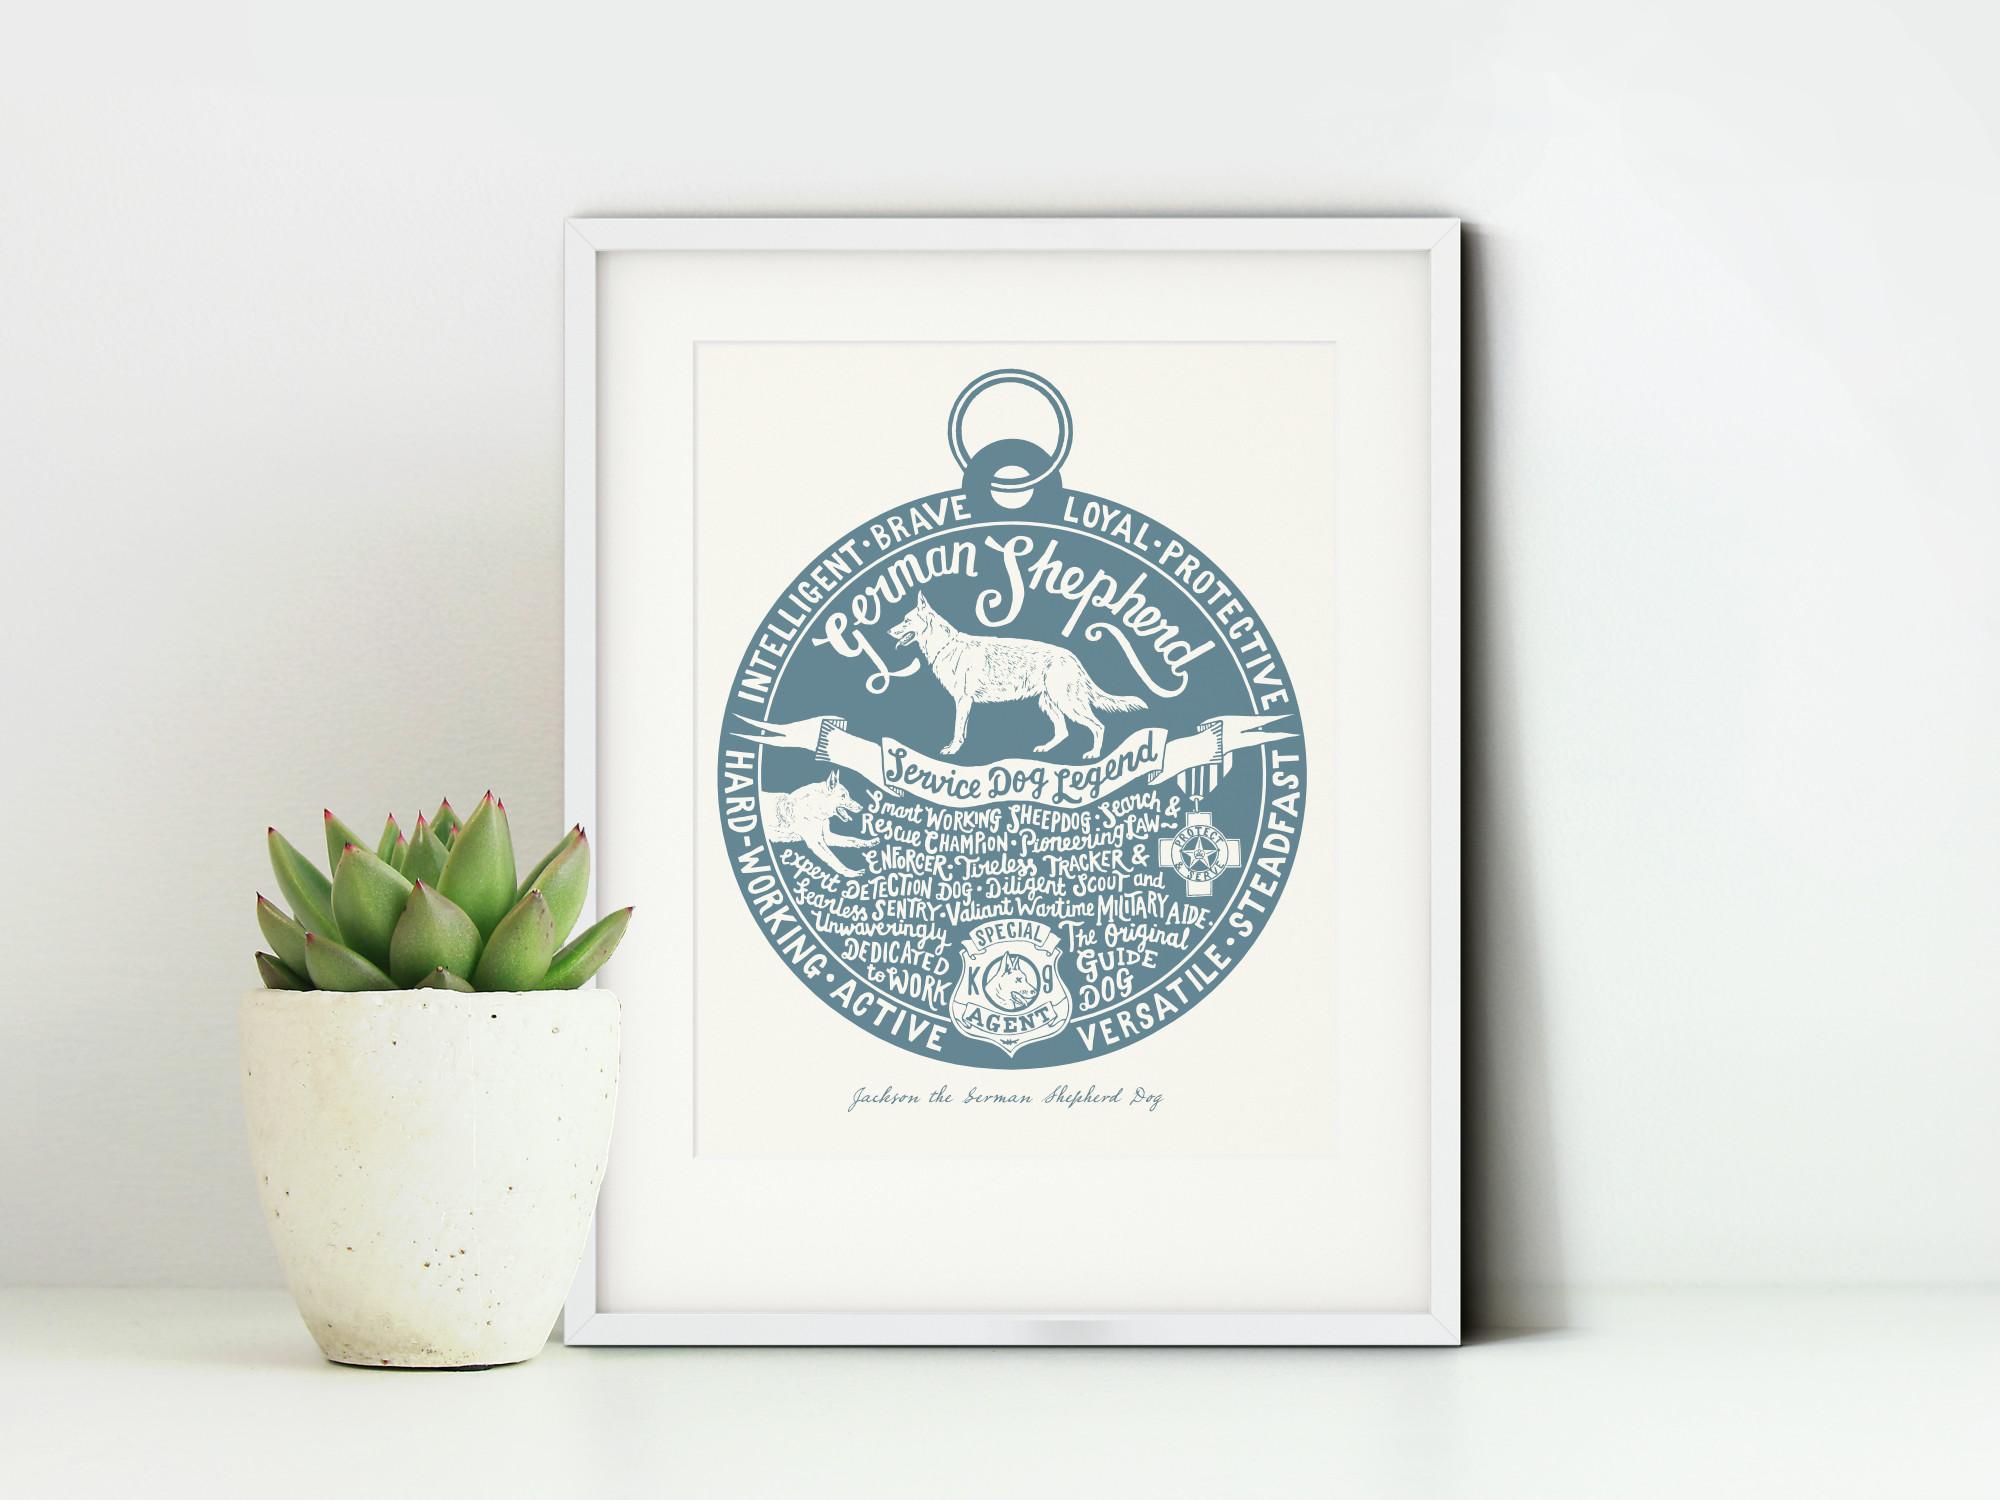 German Shepherd Dog Art Print | The Enlightened Hound